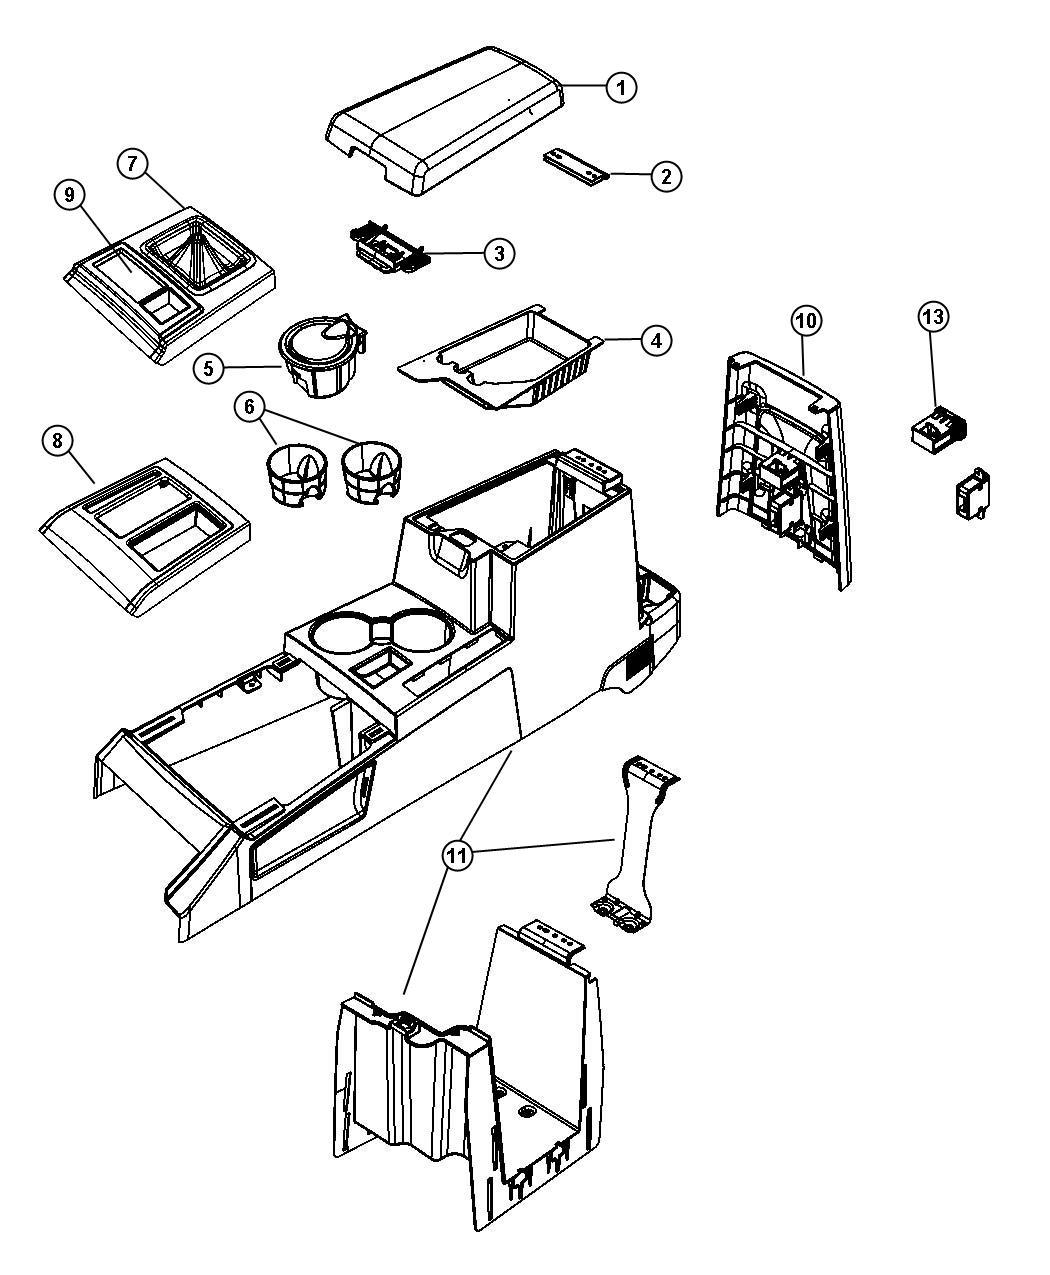 Jeep Wrangler Power Outlet Inverter Trim All Trim